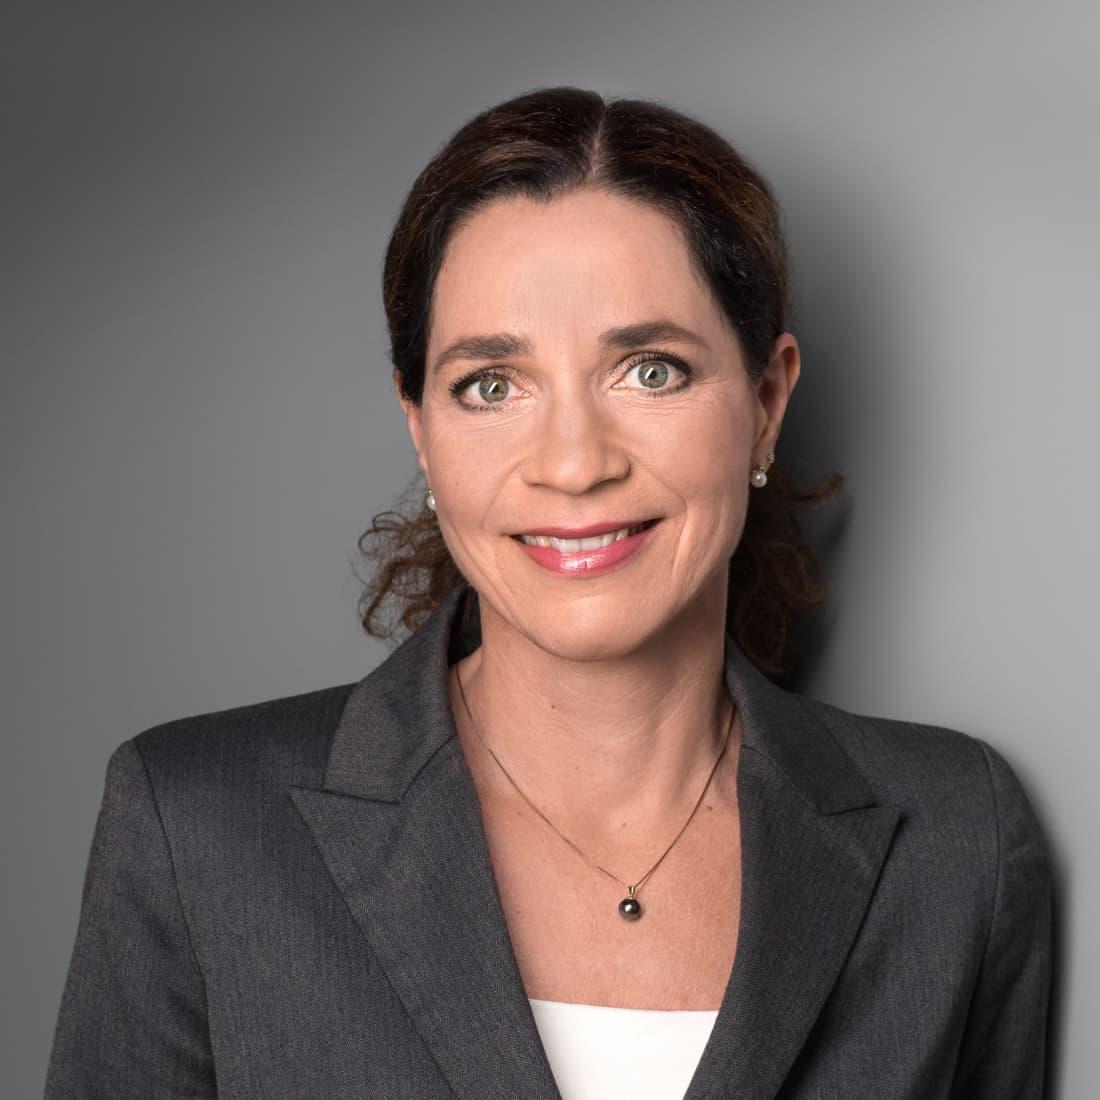 Alexandra Martini